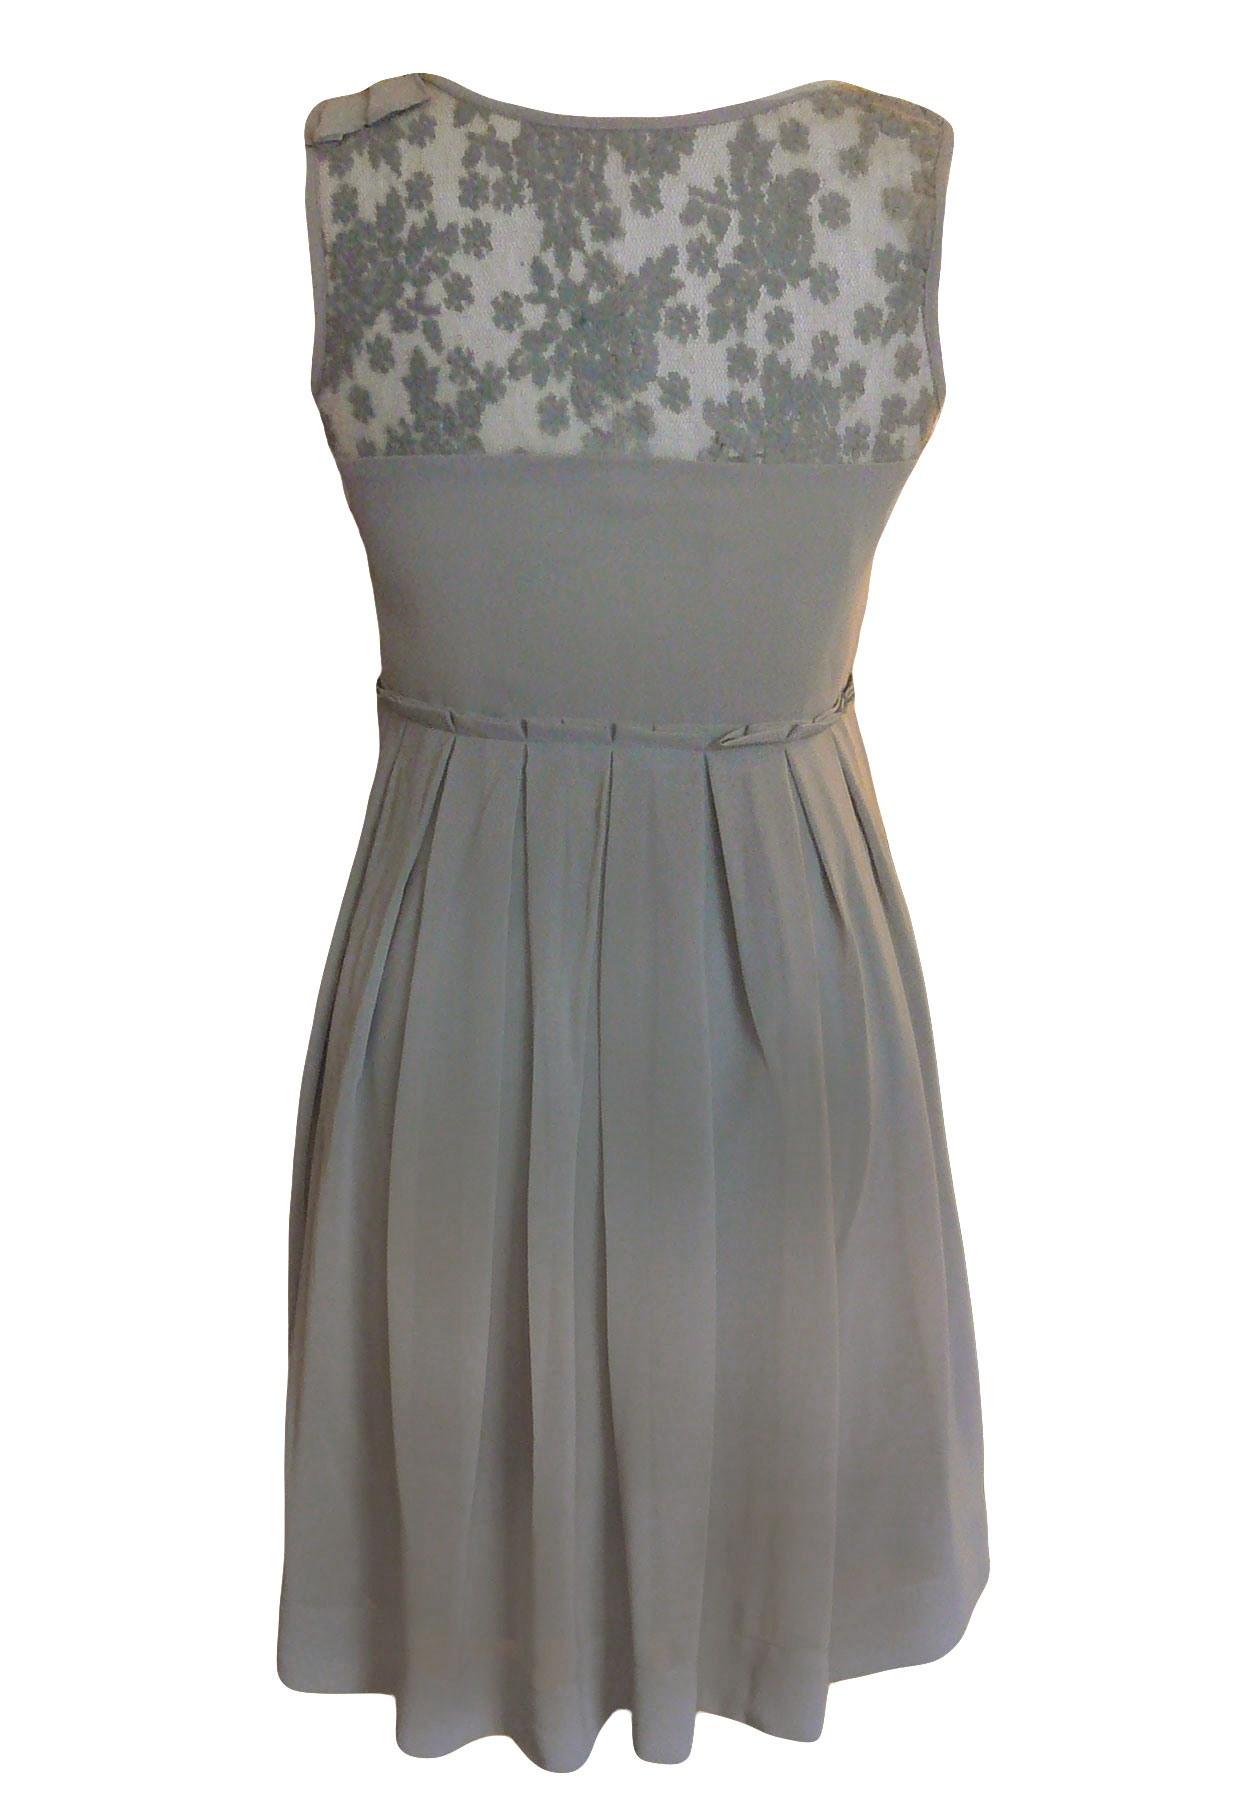 Formal Genial Graues Kleid Mit Spitze GalerieDesigner Schön Graues Kleid Mit Spitze Design